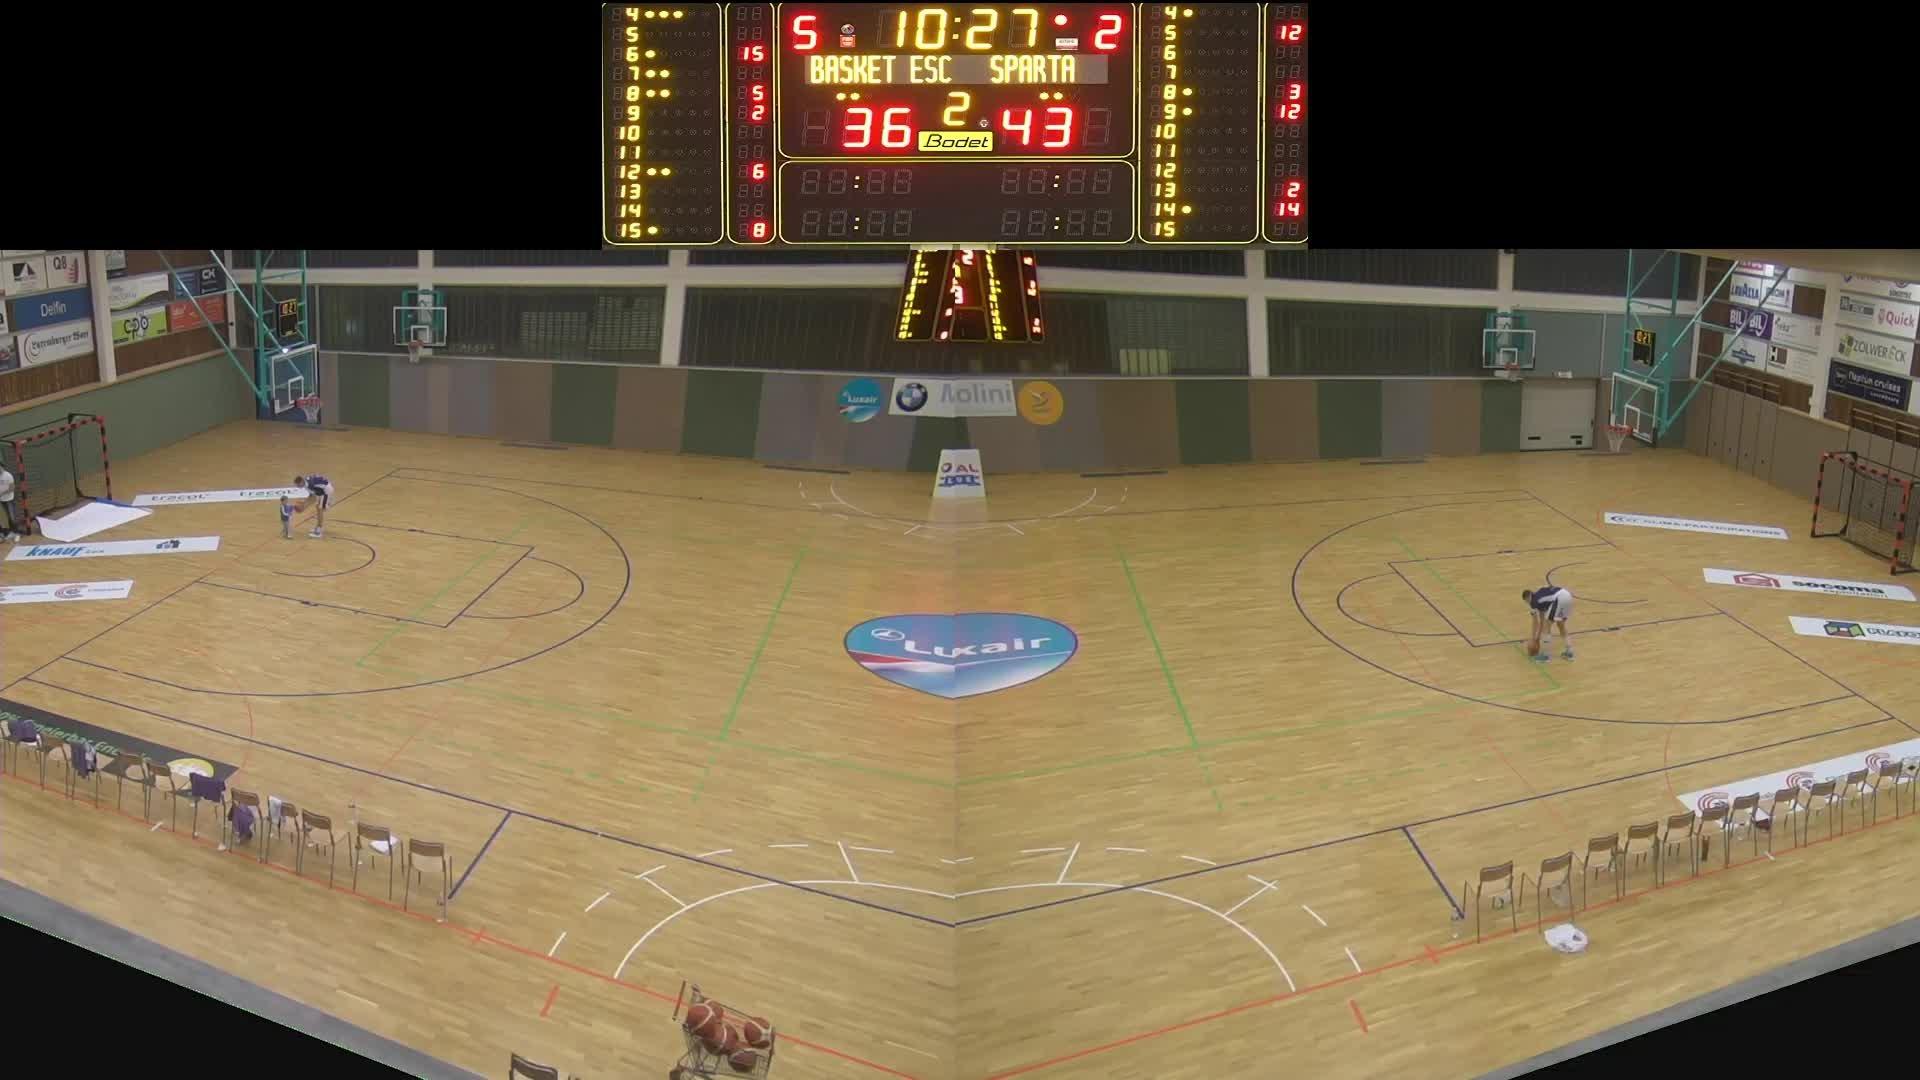 Basket Esch ( Dames A ) - Sparta - 08.11.2019